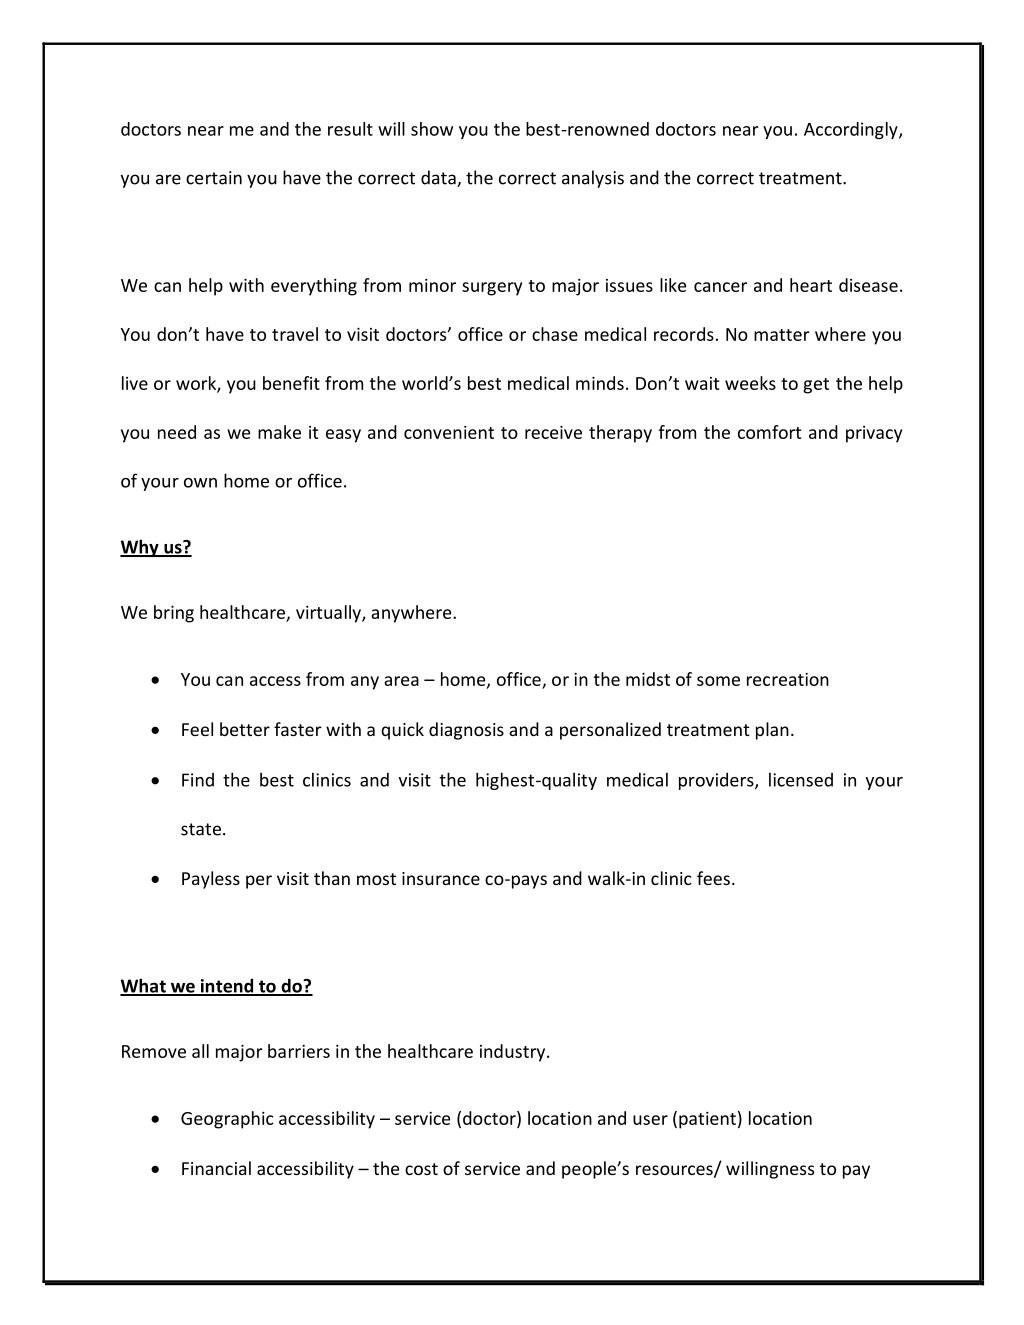 PPT - Find-Best-Clinics PowerPoint Presentation - ID:7902992